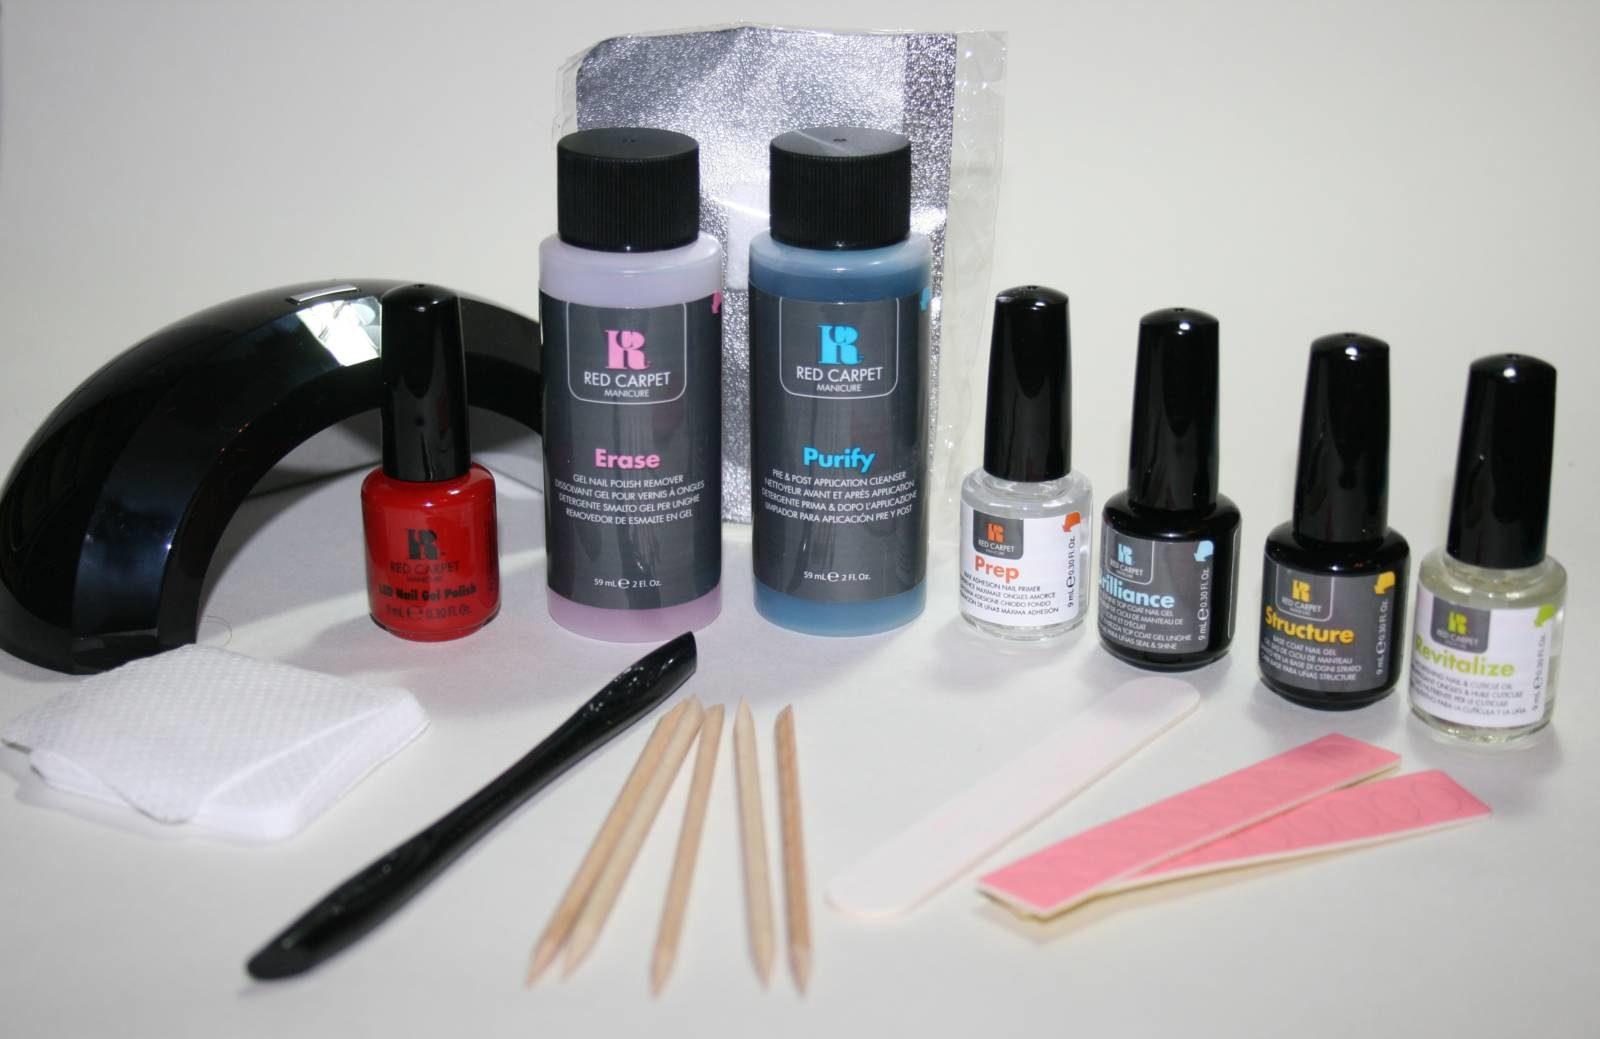 Red Carpet Manicure Starter Kit with Pro Light